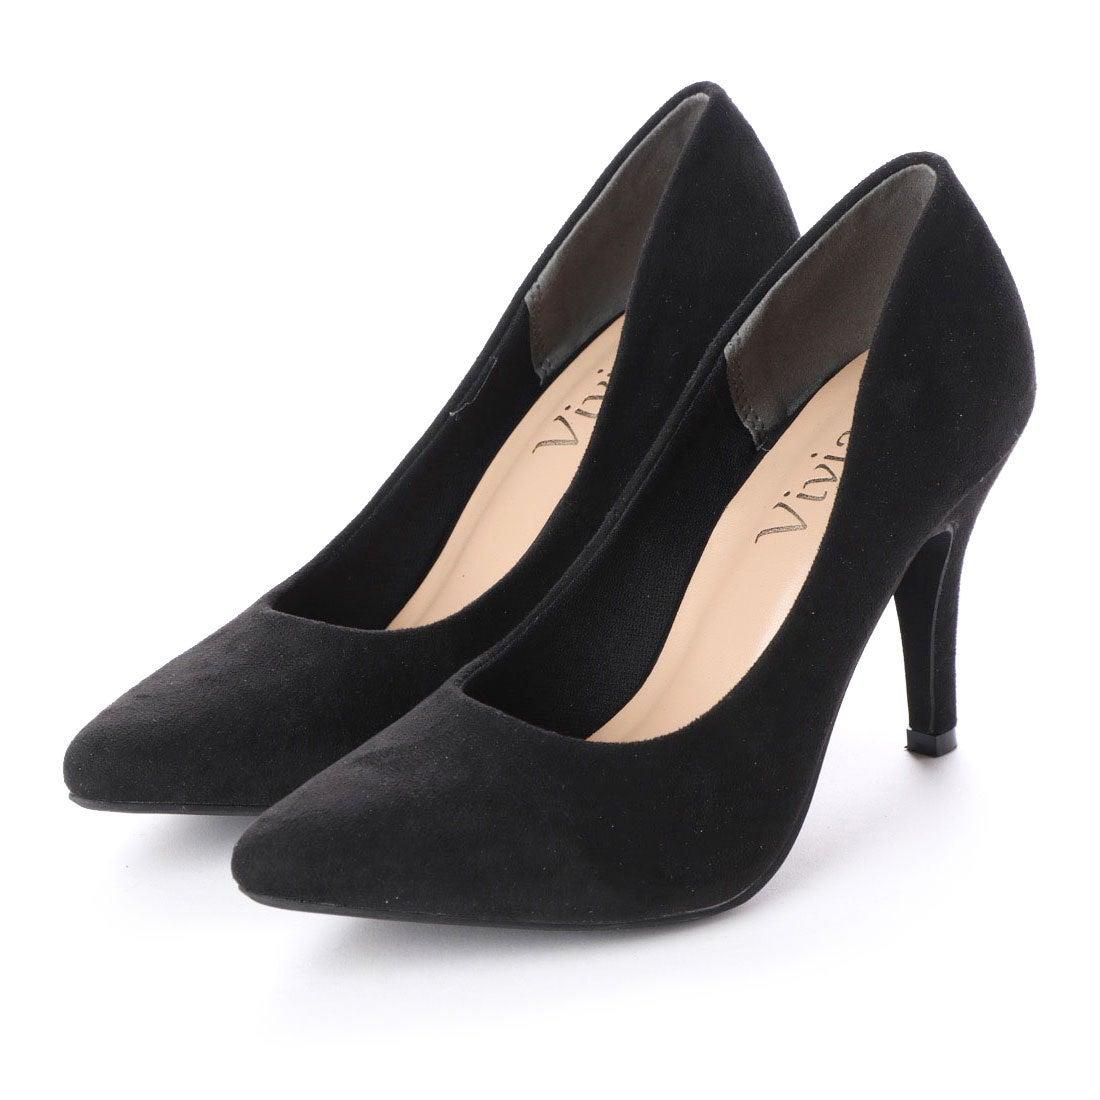 3f0b3095beae90 ヴィヴィアン Vivian ポインテッドトゥ9cmキレイめパンプス (ブラックスエード) -靴&ファッション通販 ロコンド〜自宅で試着、気軽に返品